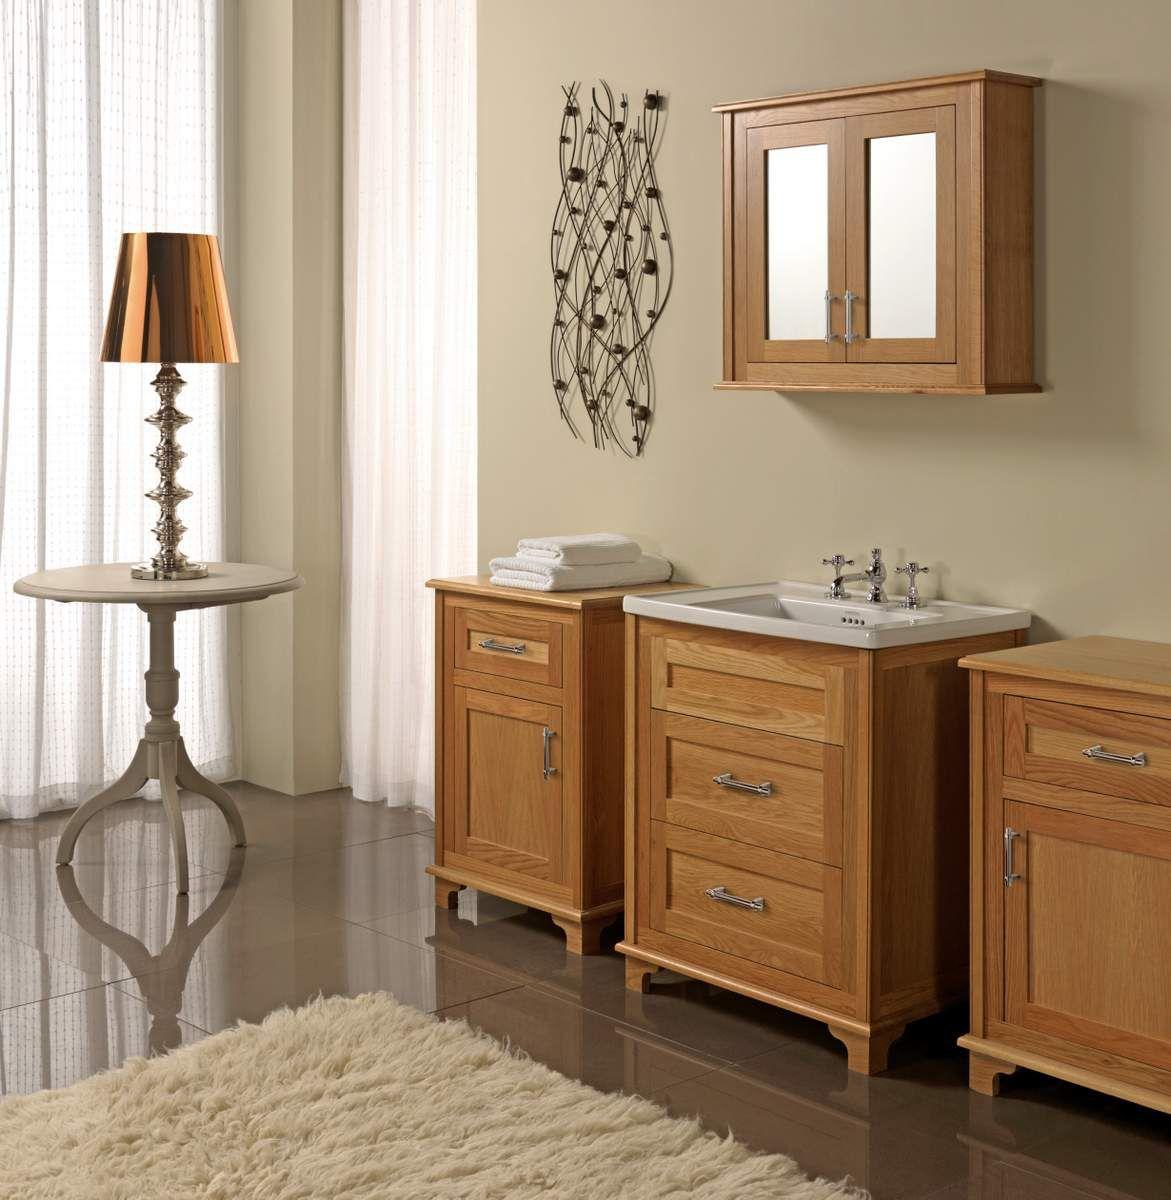 Thistle Sage Apartments: Imperial Radcliffe Thurlestone 2 Door Mirror Cabinet : UK